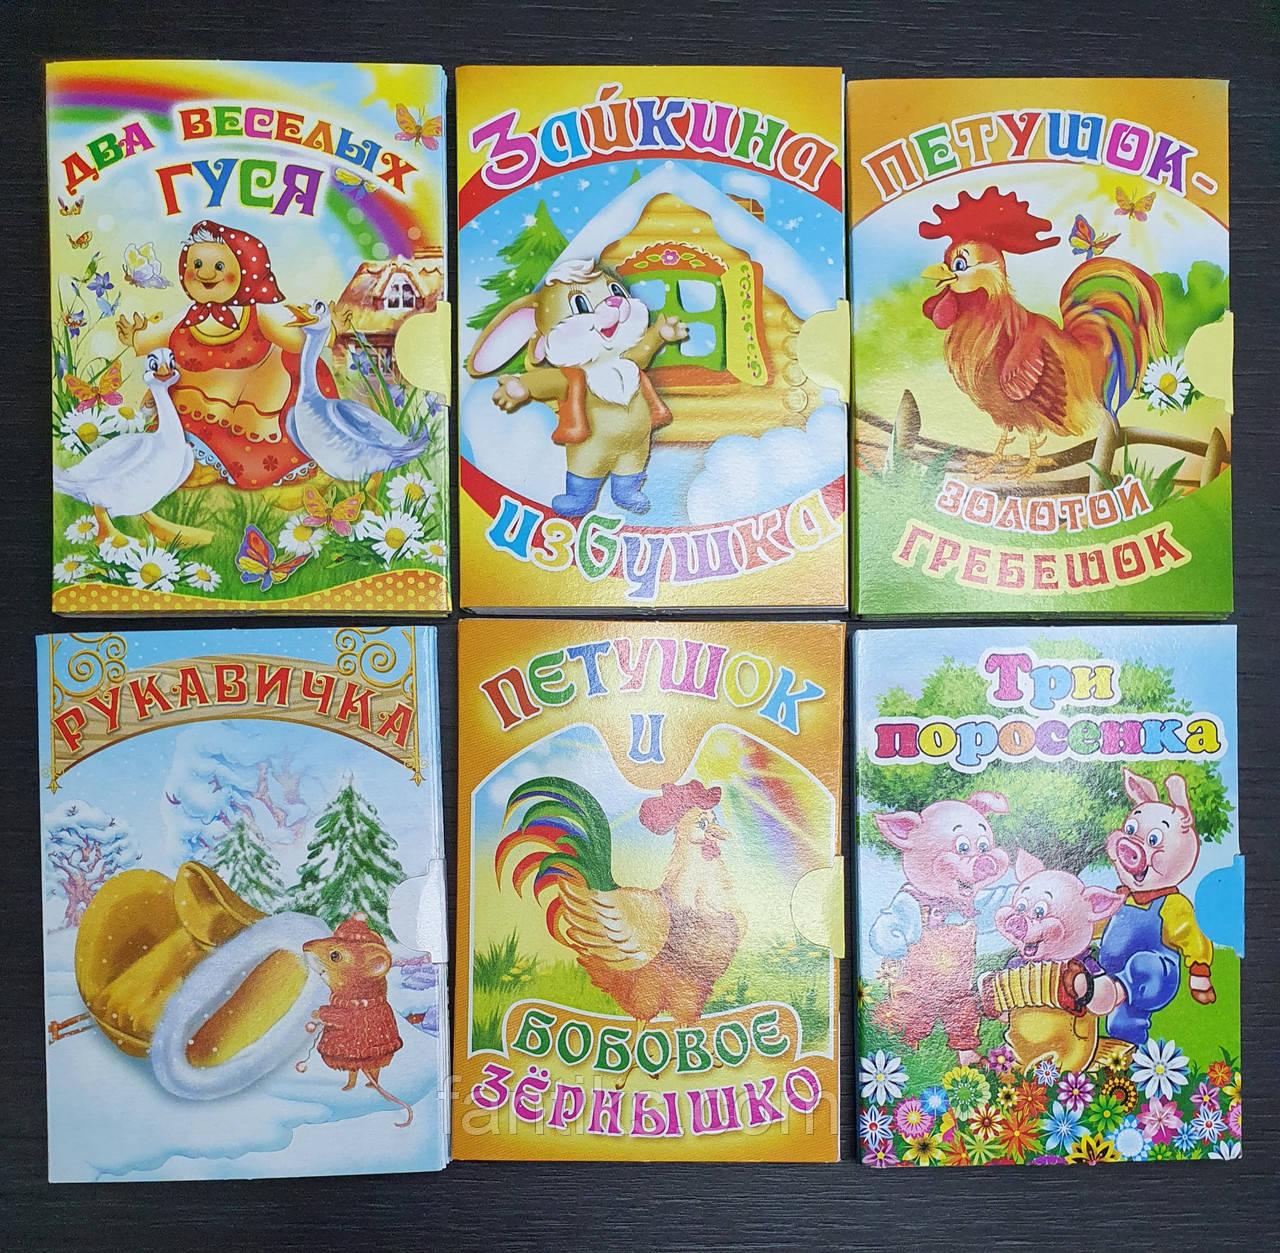 Набор старых добрых сказок на русском языке(номер 4) - 6 штук